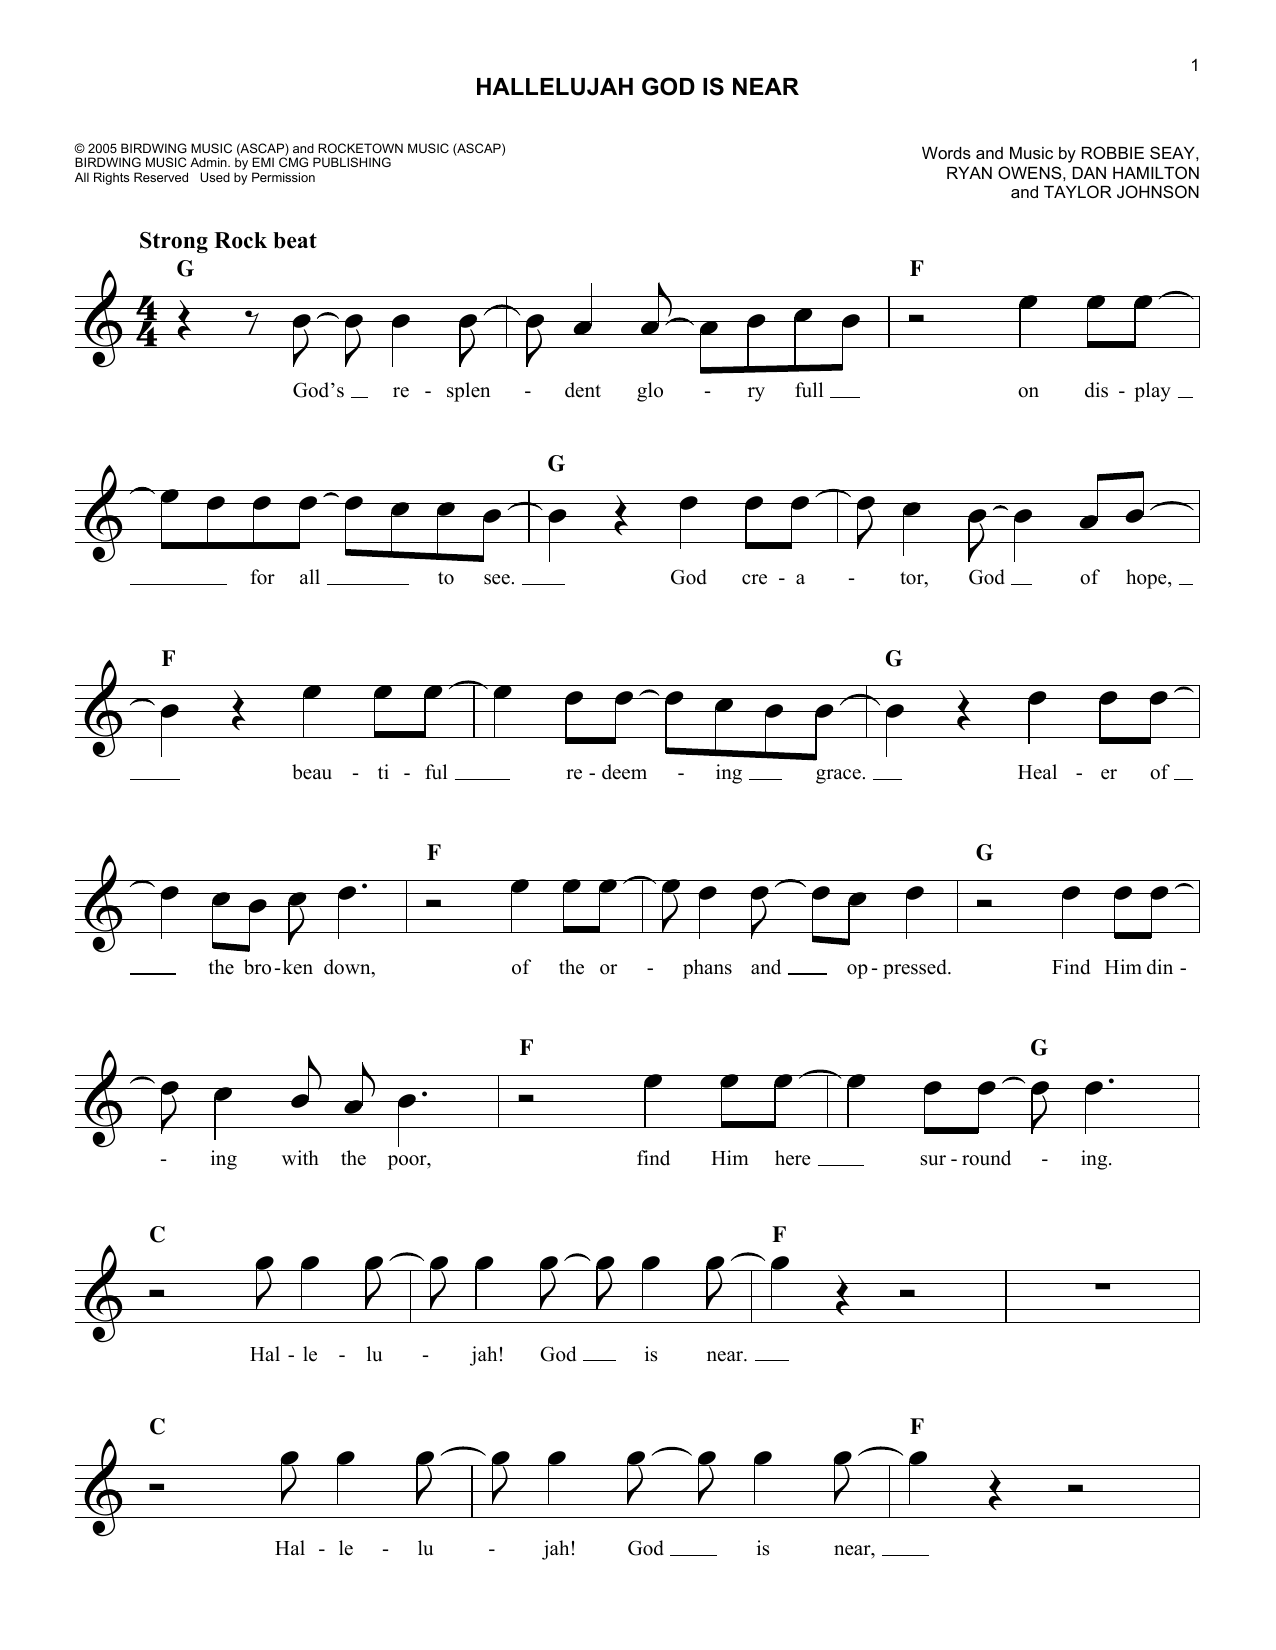 Hallelujah god is near chords by robbie seay band melody line hallelujah god is near sheet music hexwebz Images